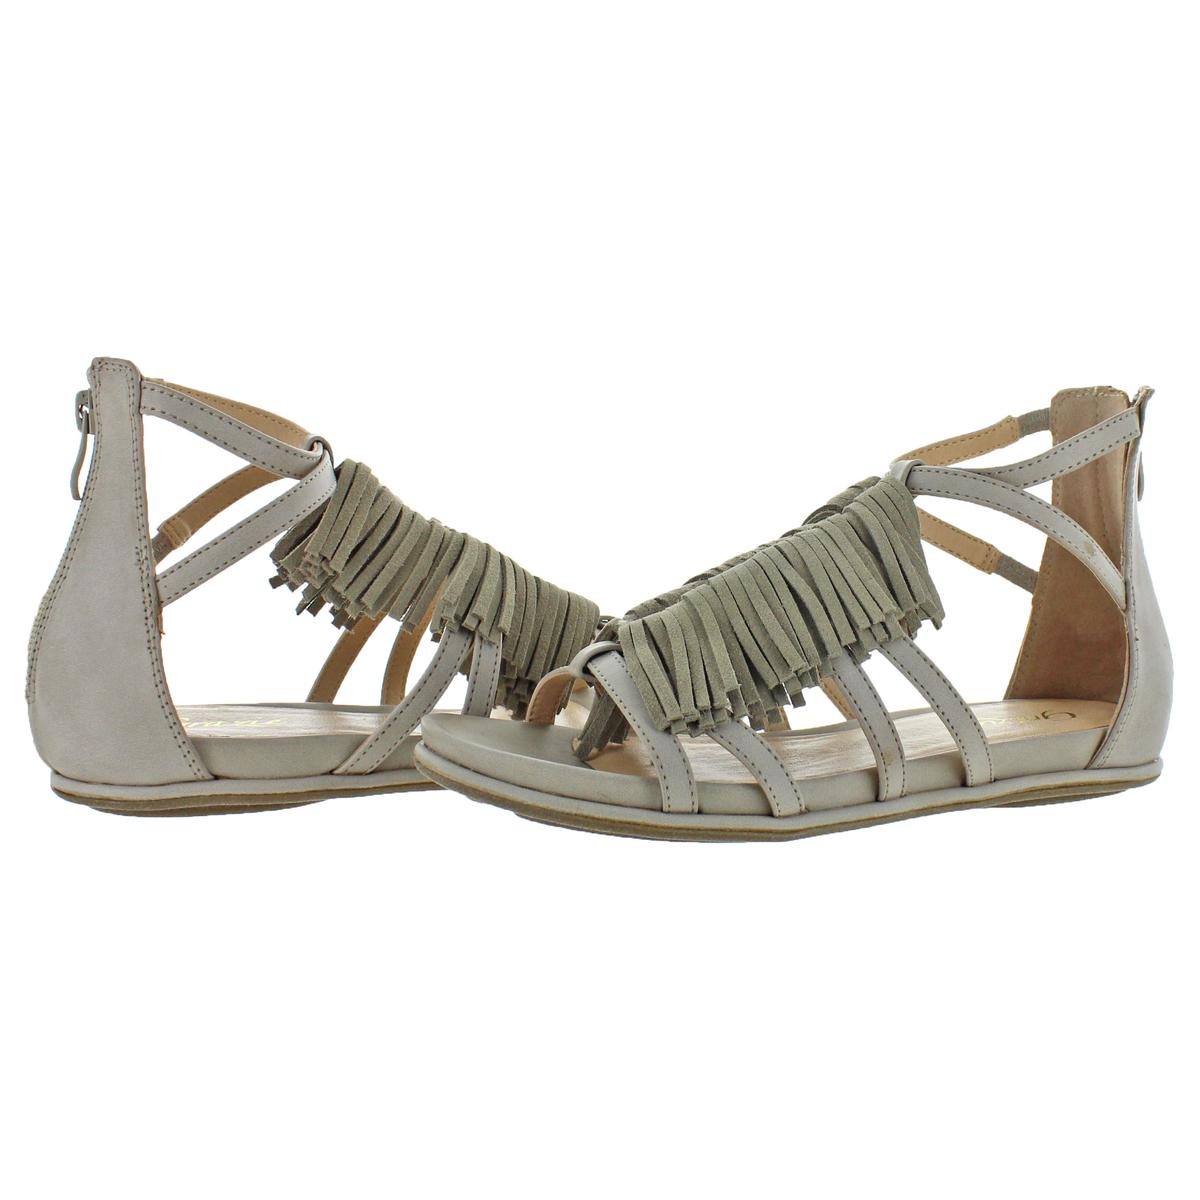 03749ef1de61 Grazie Footwear Women s Trista Leather Fringe Gladiator Sandals Shoes